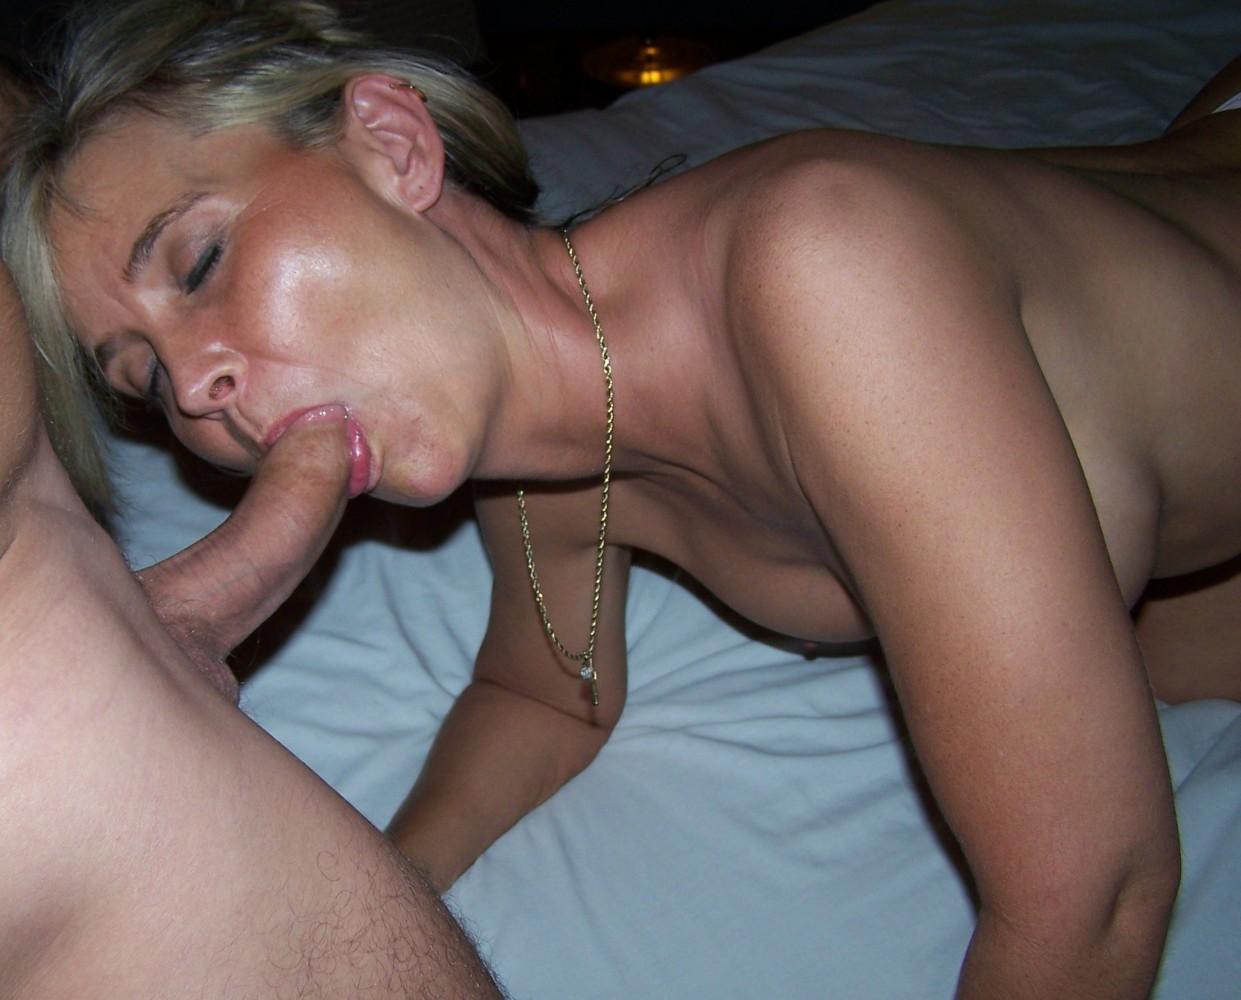 Mature blond blowjob pic galleries